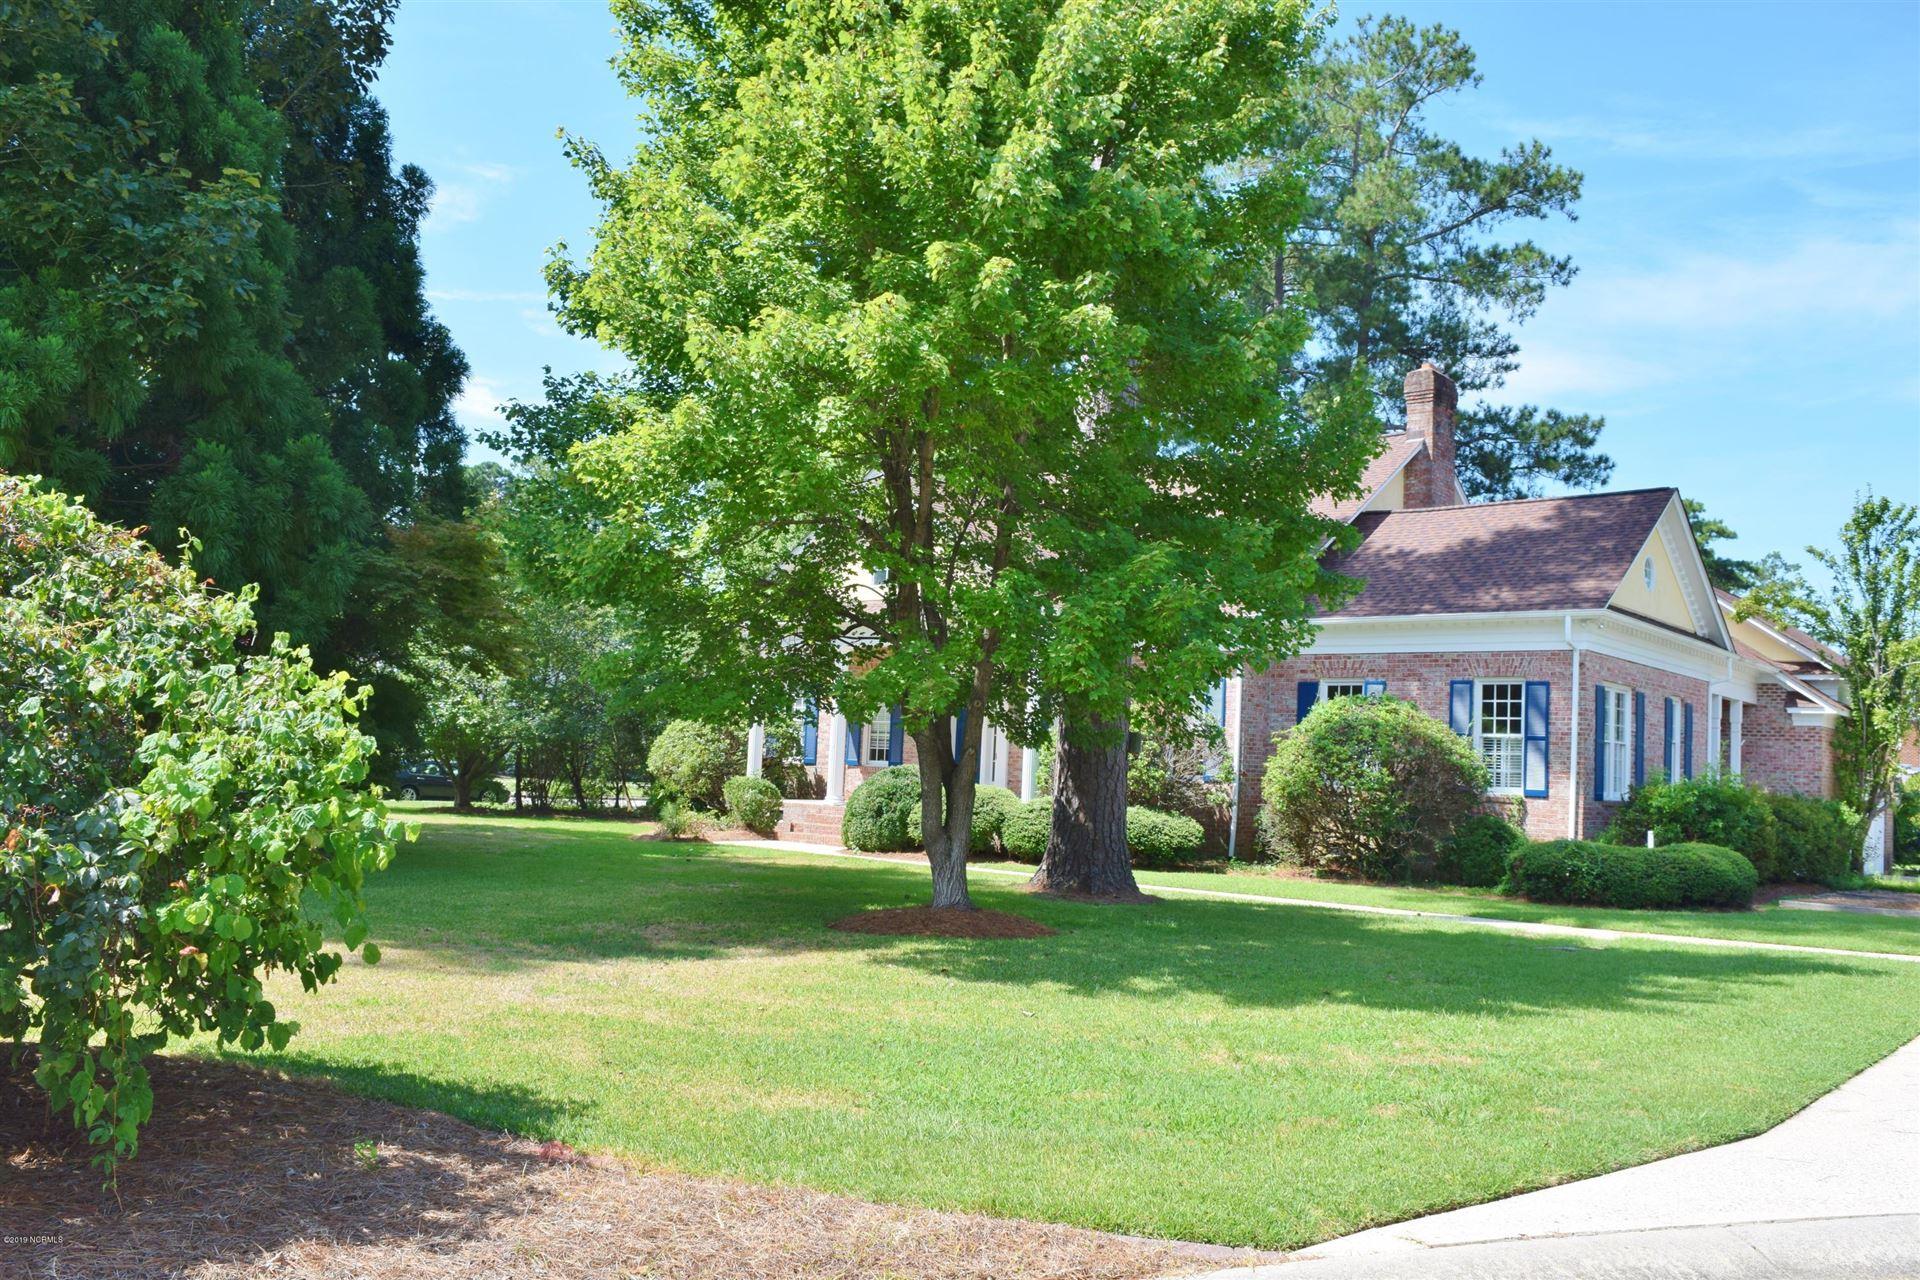 Photo of 3802 Saxon Court, Greenville, NC 27834 (MLS # 100276965)